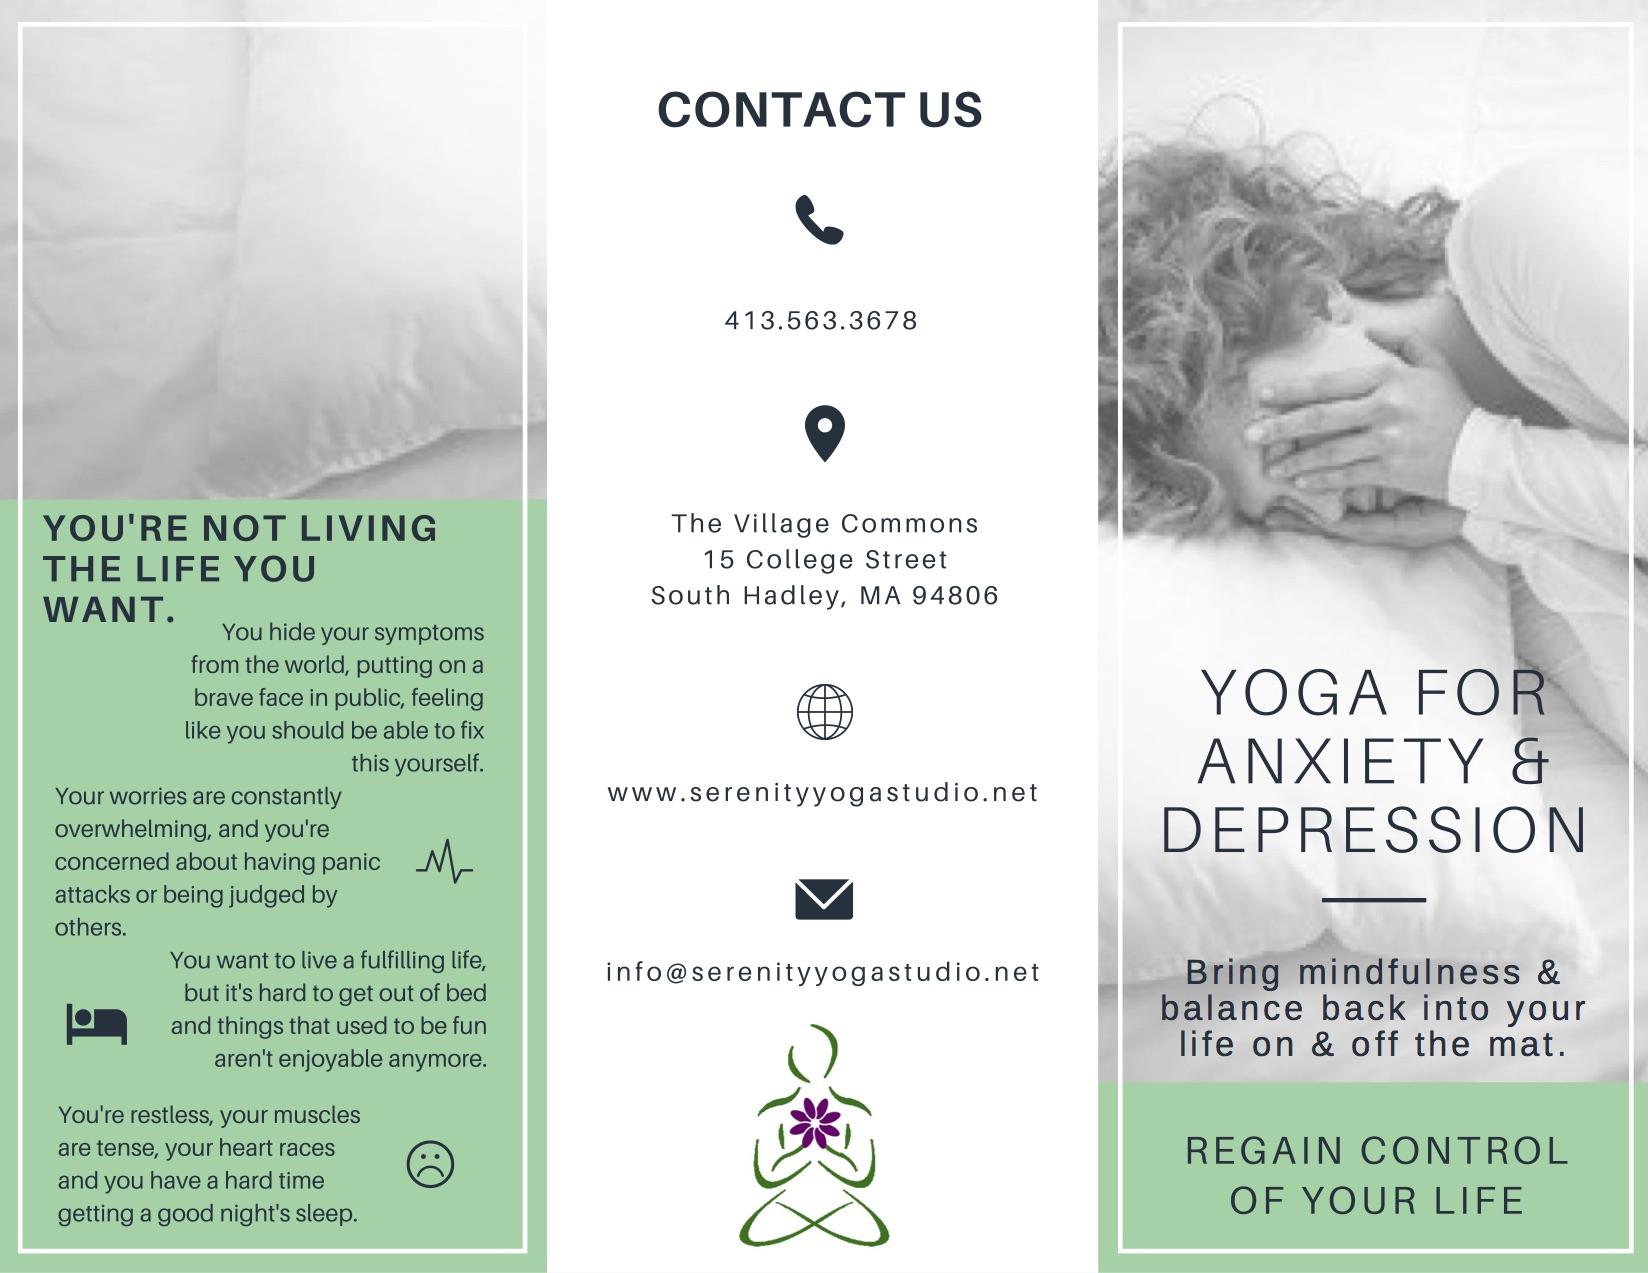 Yoga for Anx. & Dep. Brochure - Serenity Yoga (3)_pg 1.jpg